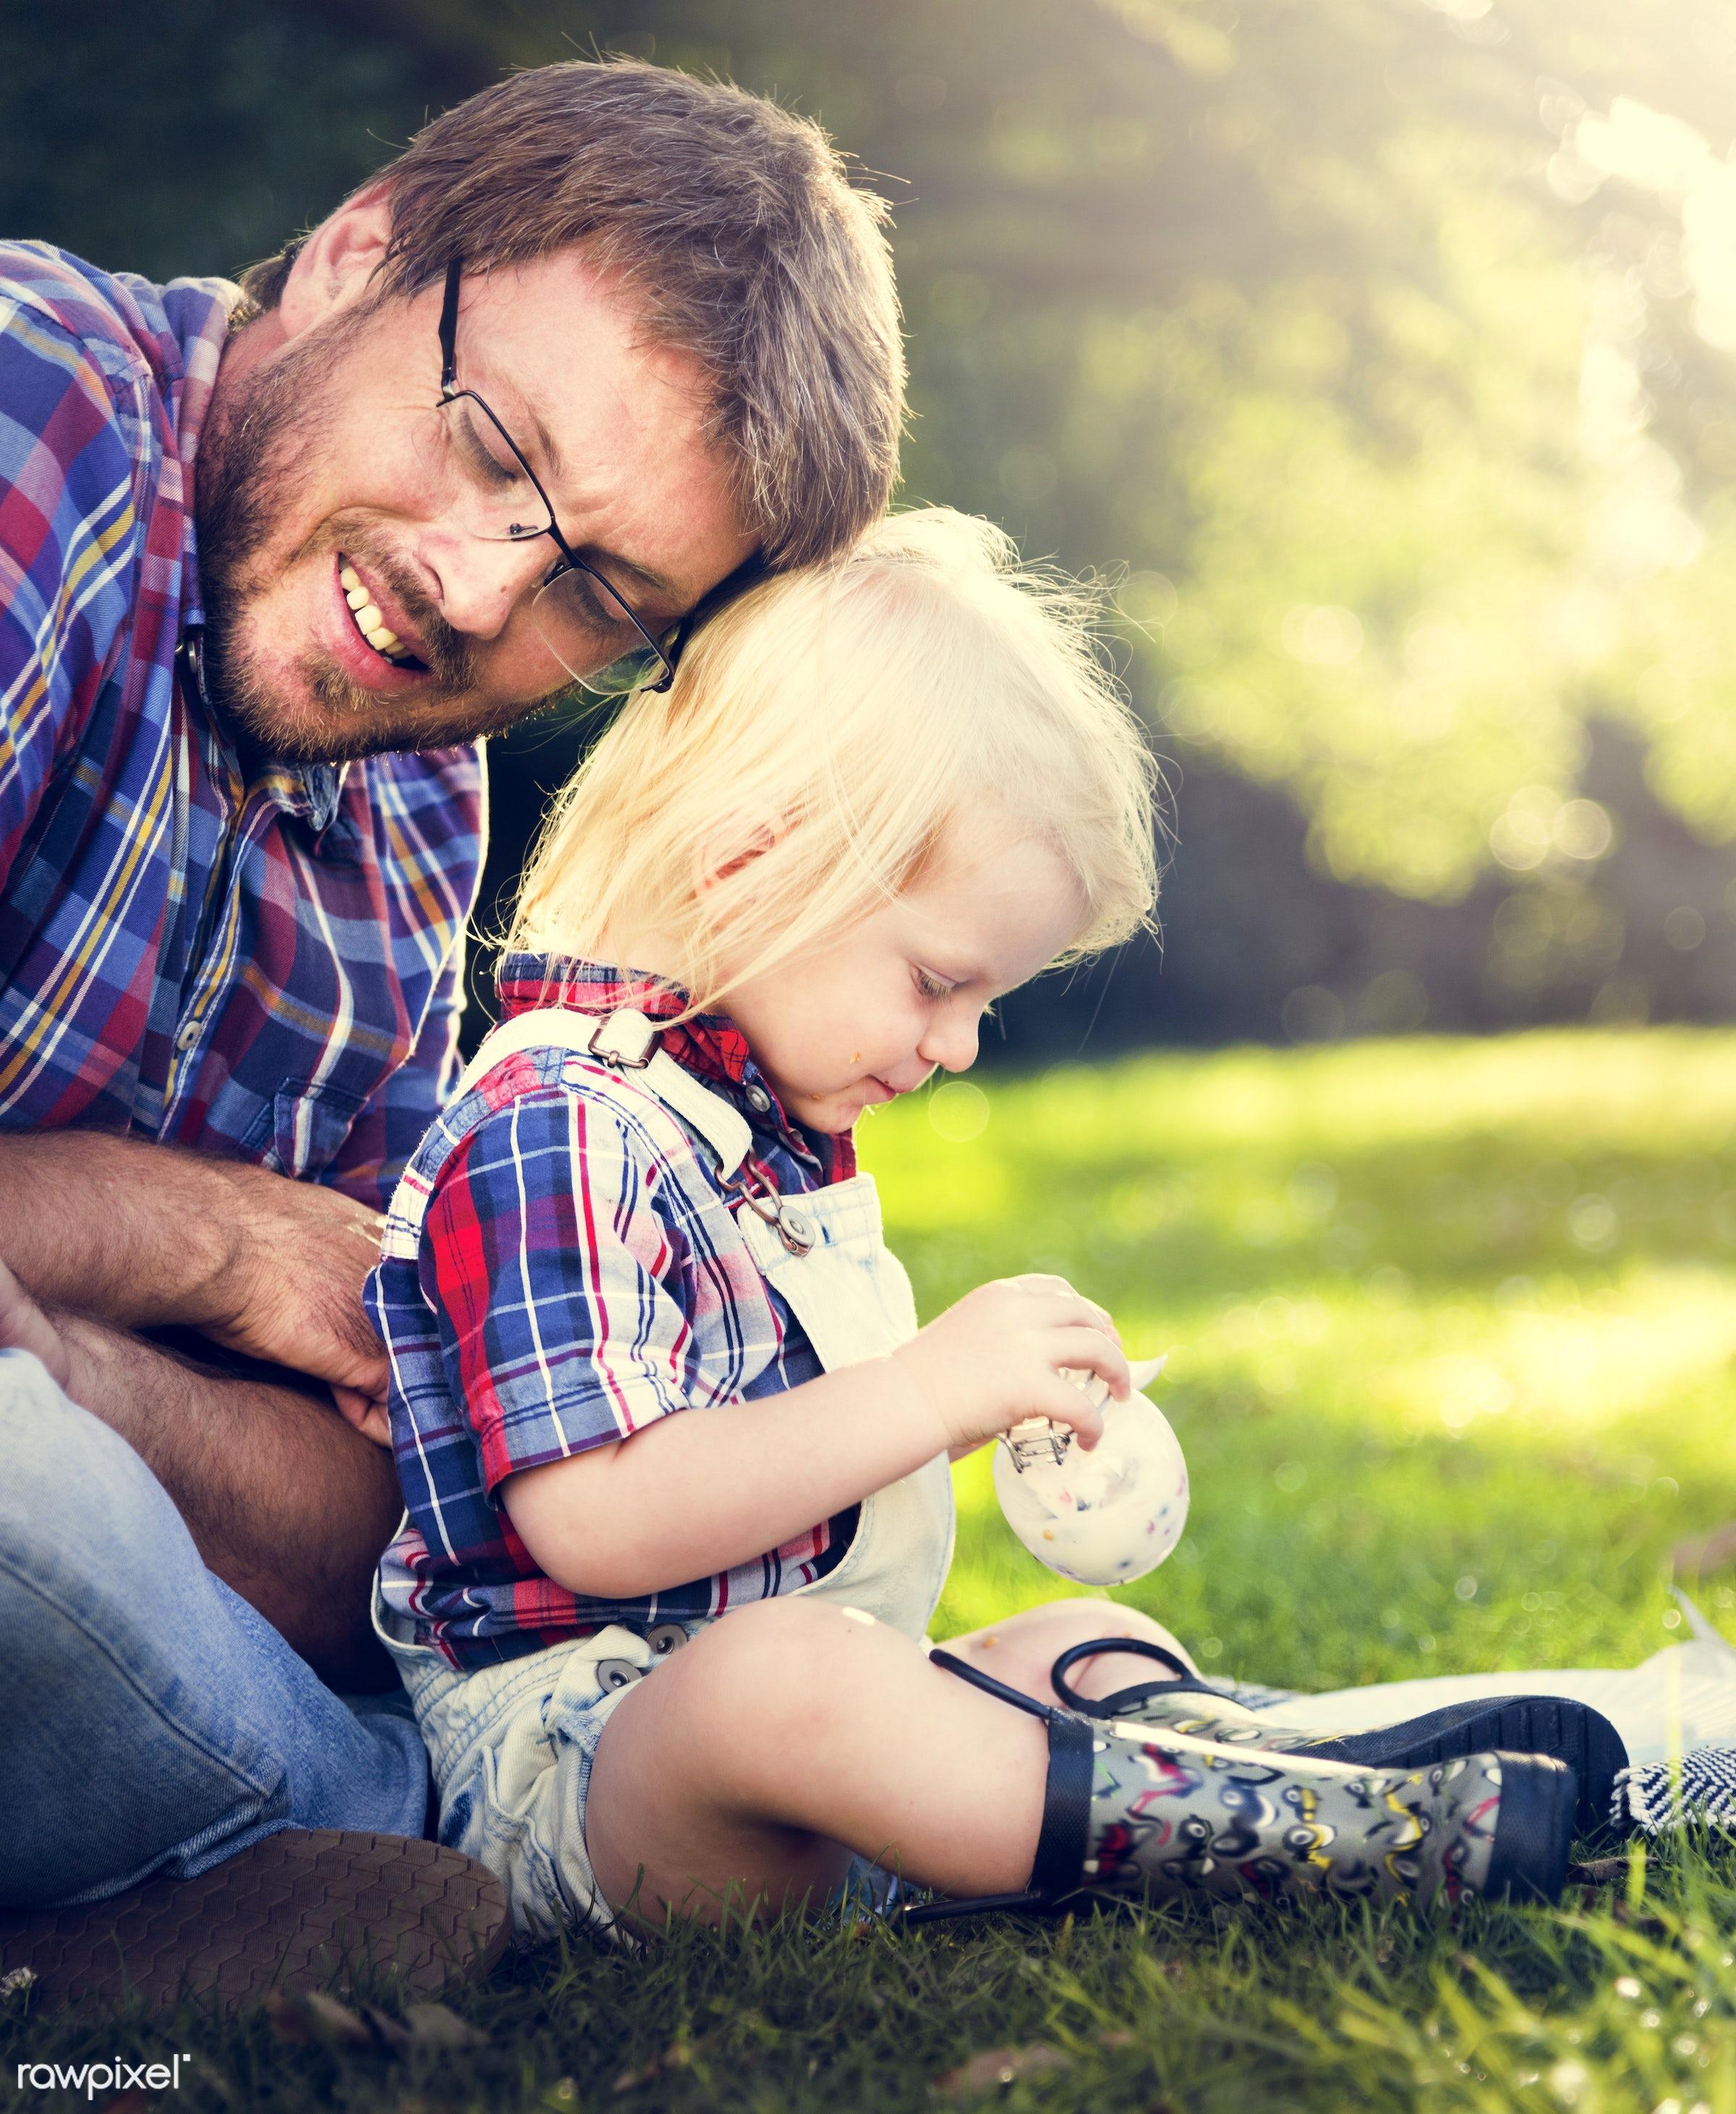 bonding, boy, care, casual, cheerful, child, childhood, dad, enjoyment, environmental, family, father, field, fun, garden,...